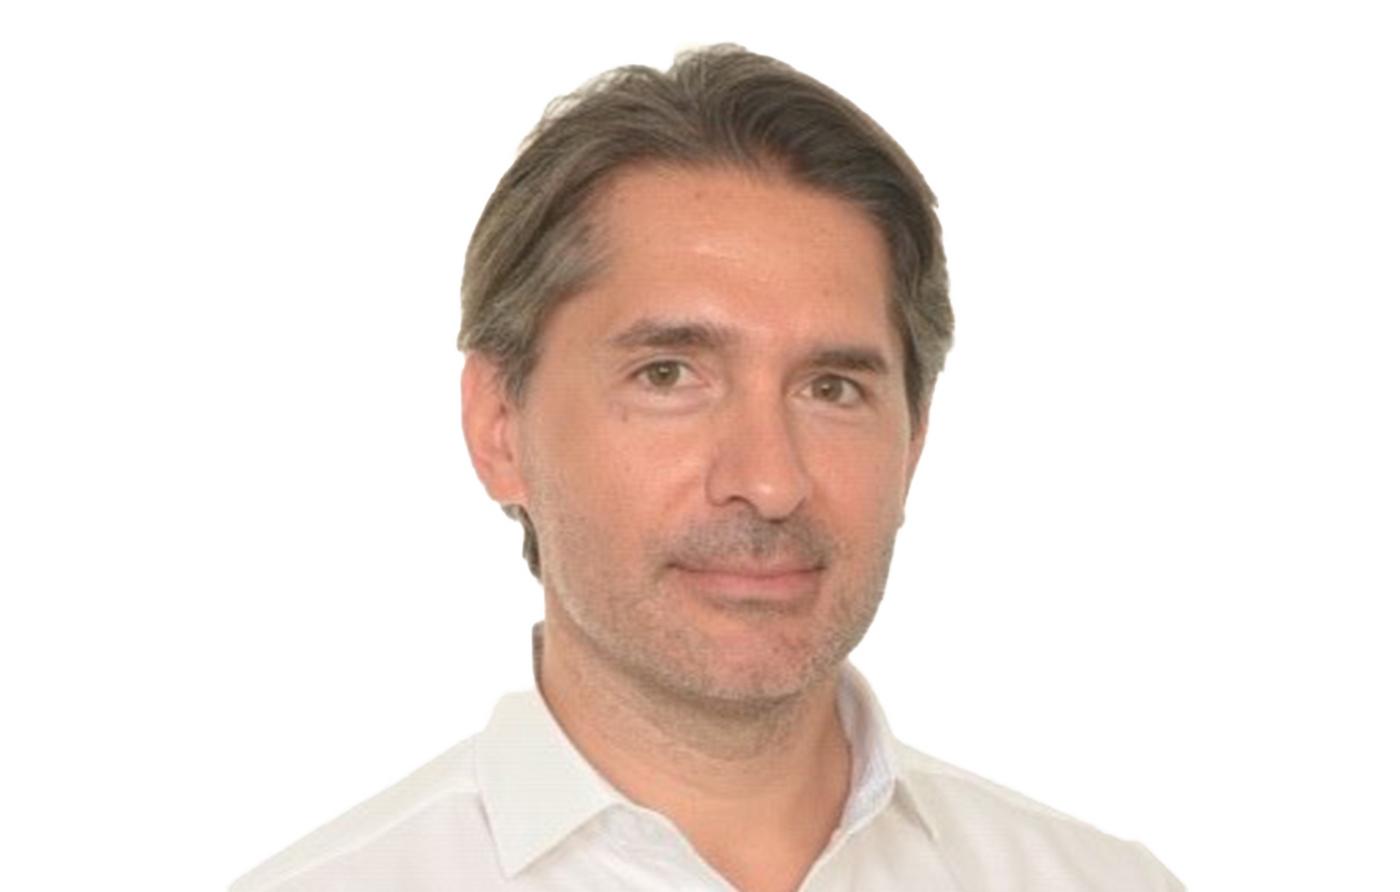 Dr. Miro Mirkovic